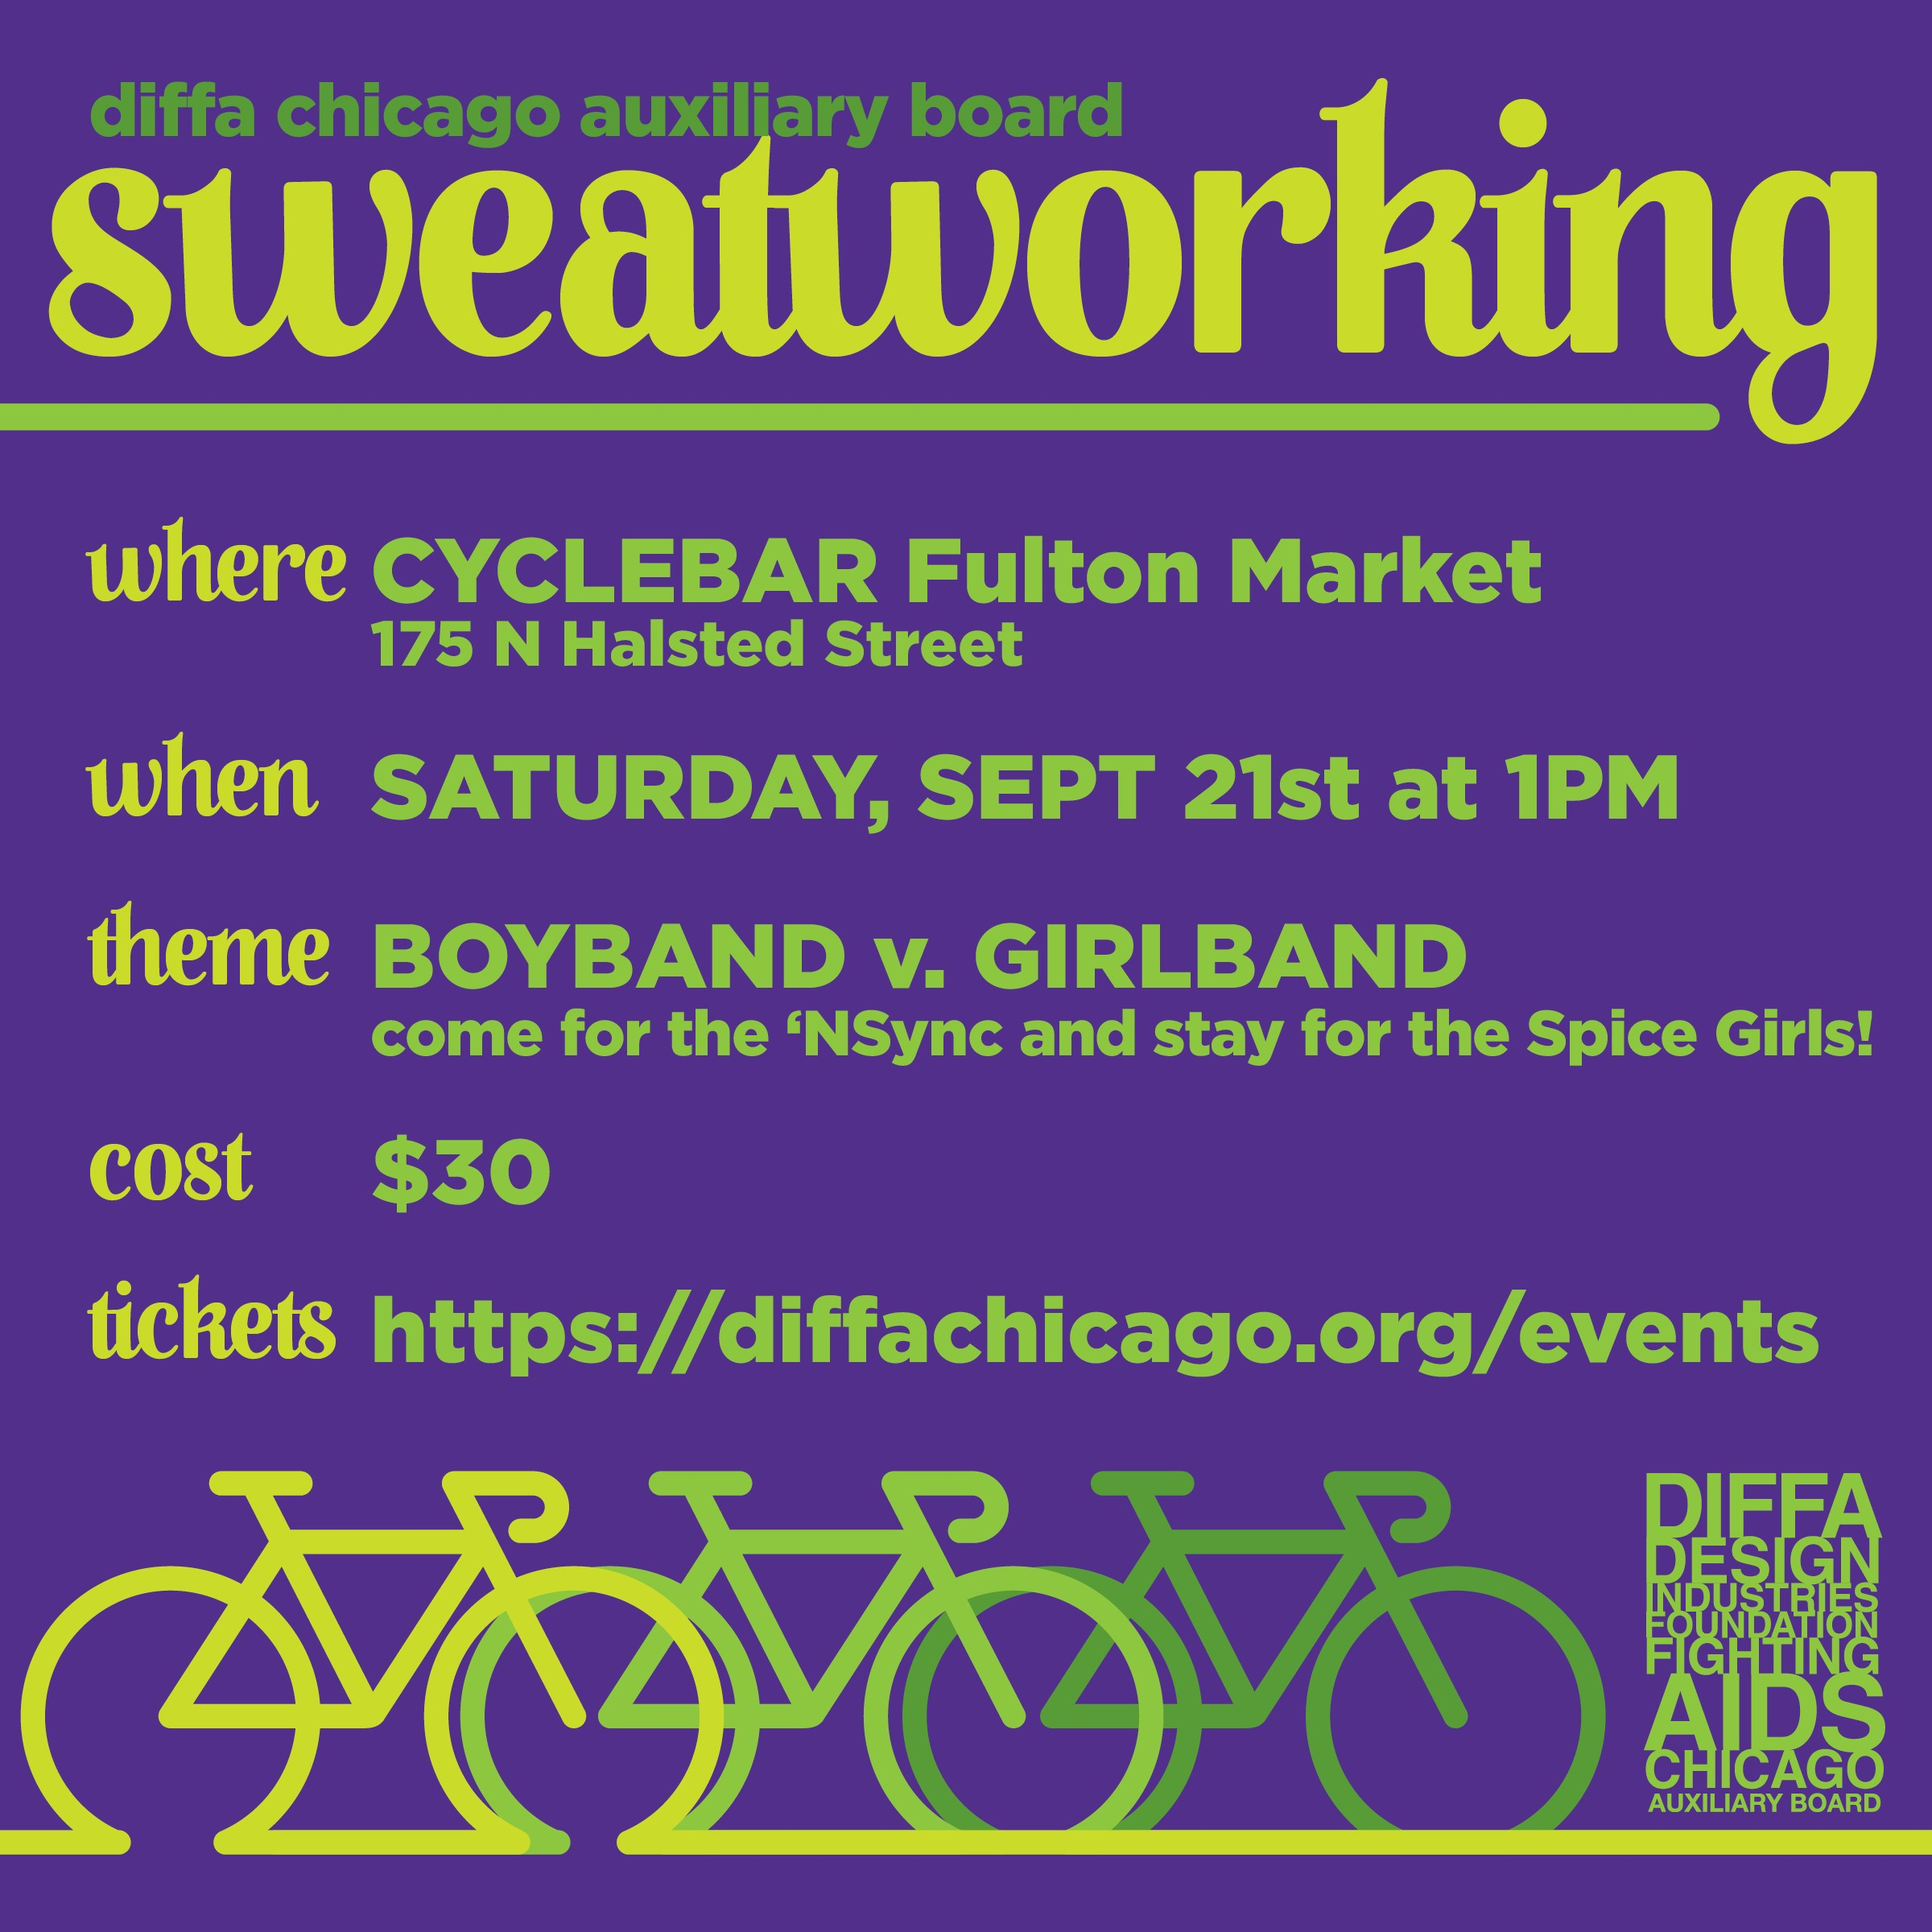 DIFFA/Chicago Auxiliary Board Sweatworking